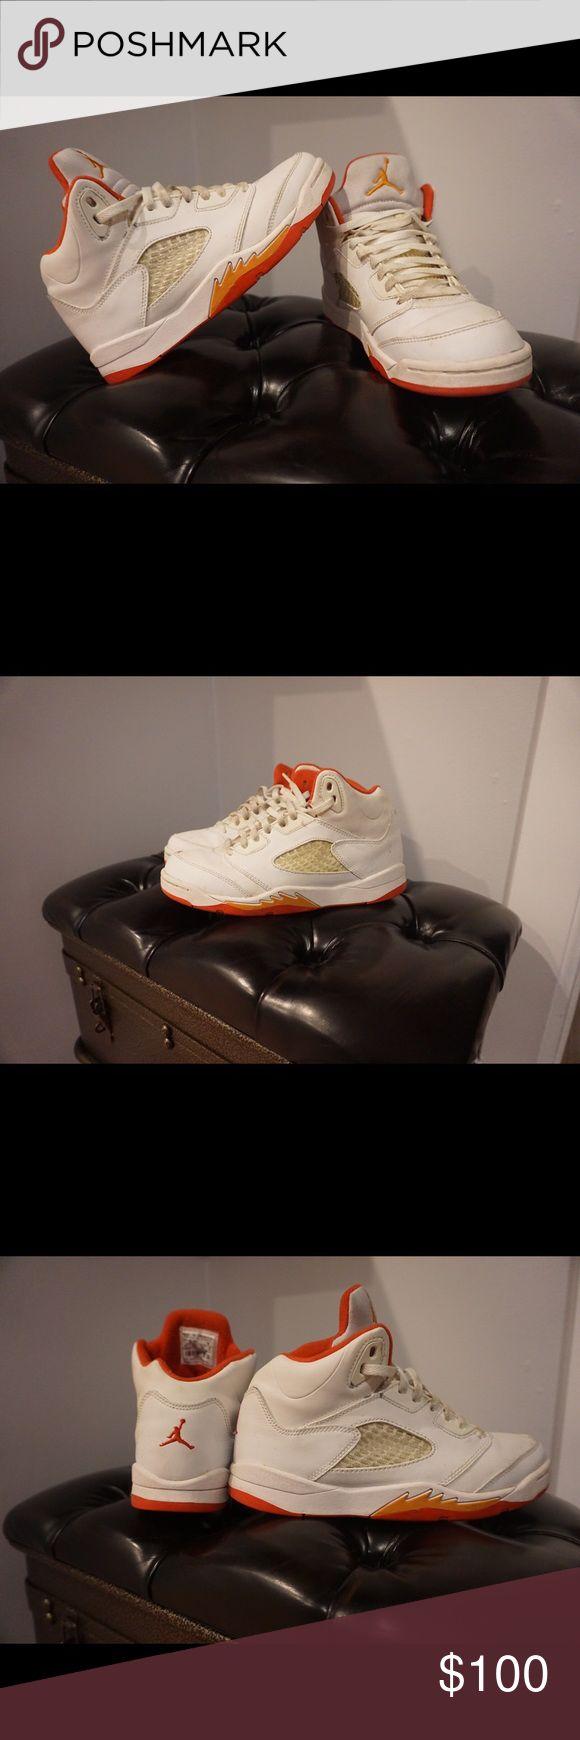 RETRO 5's JORDAN!! 🎉 Size 3 kids RETRO 5 JORDANS!!! Classic kicks. Good condition, you won't find these anywhere. Super comfortable. White/Fire-Red-Sunset-Dk CNDR. Jordan Shoes Sneakers